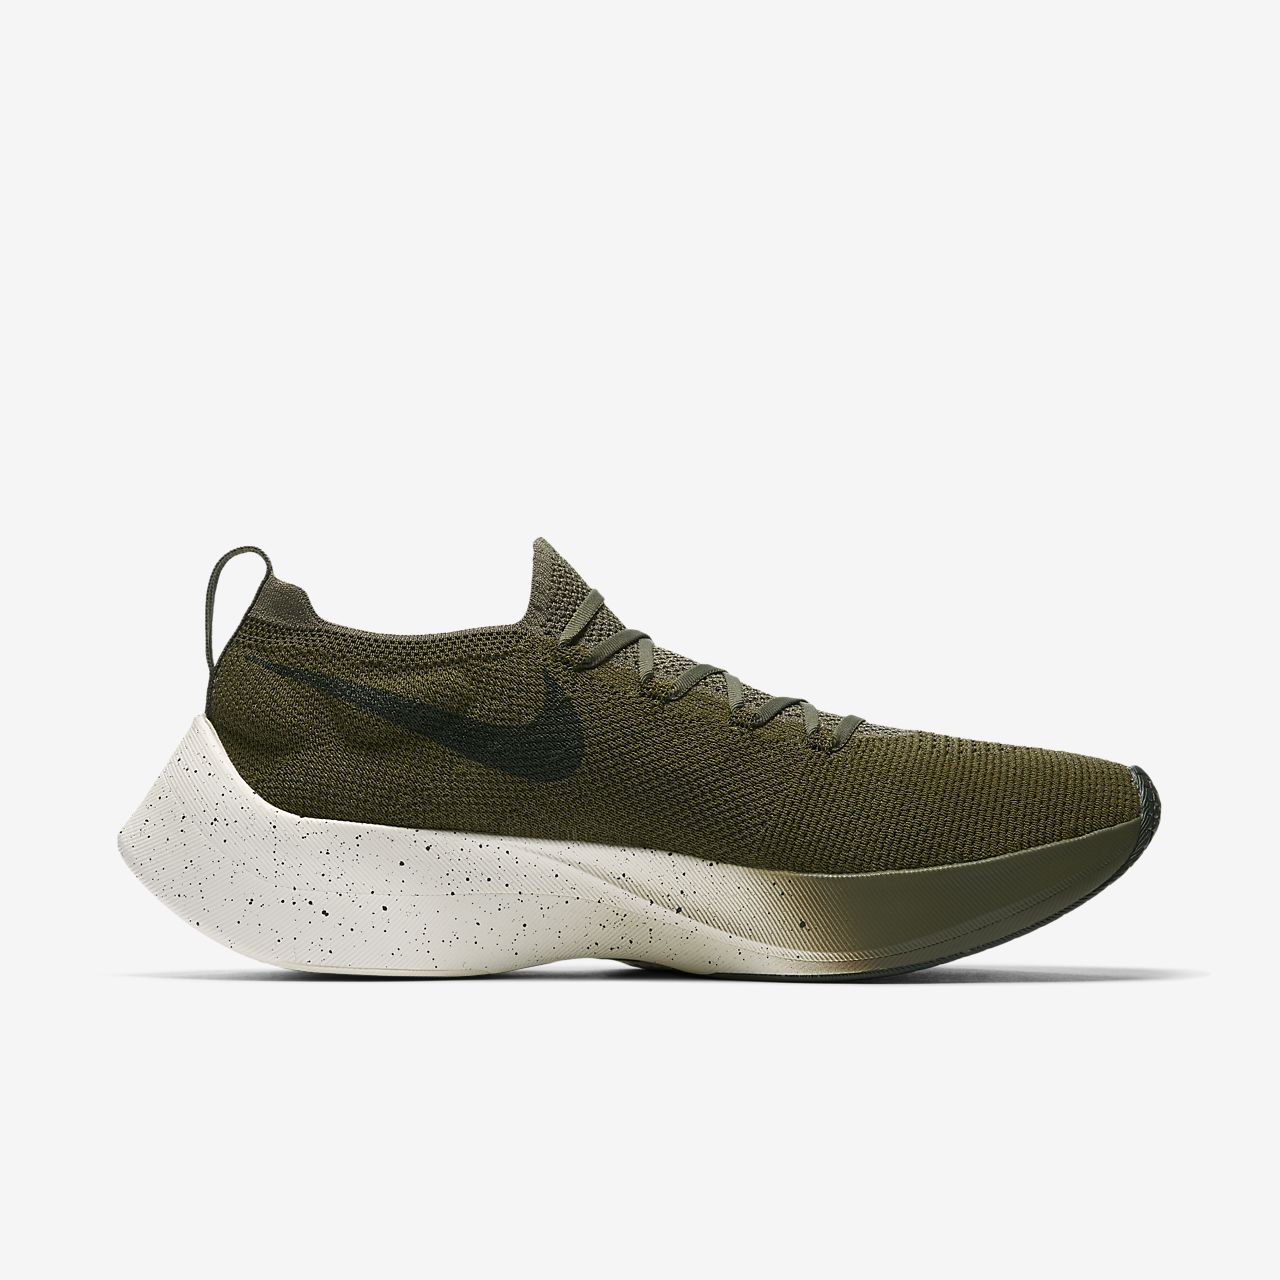 huge selection of 34408 6e3df ... Scarpa Nike React Vapor Street Flyknit - Uomo